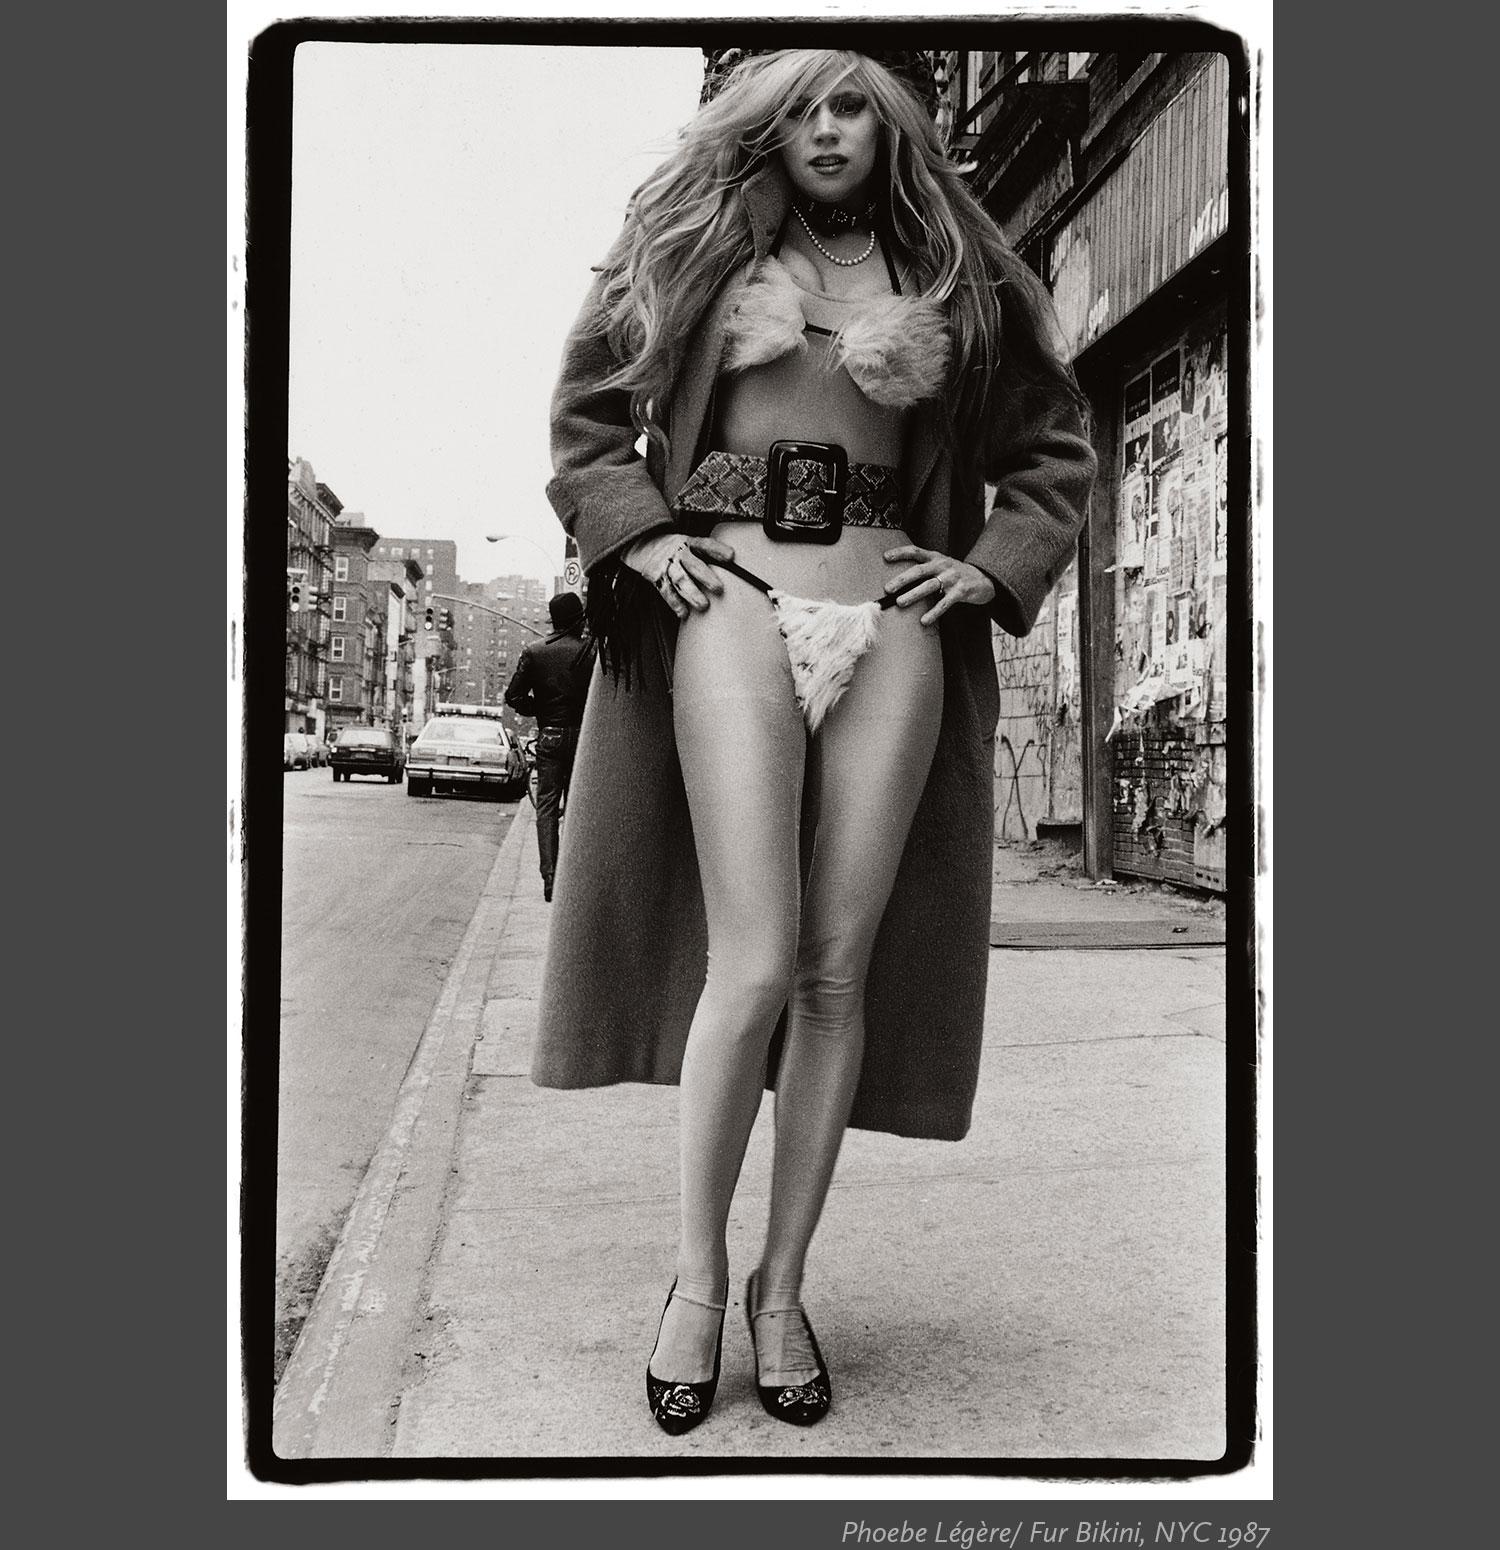 17_Phoebe-Legere-Fur-Bikini,-NYC-1987.jpg